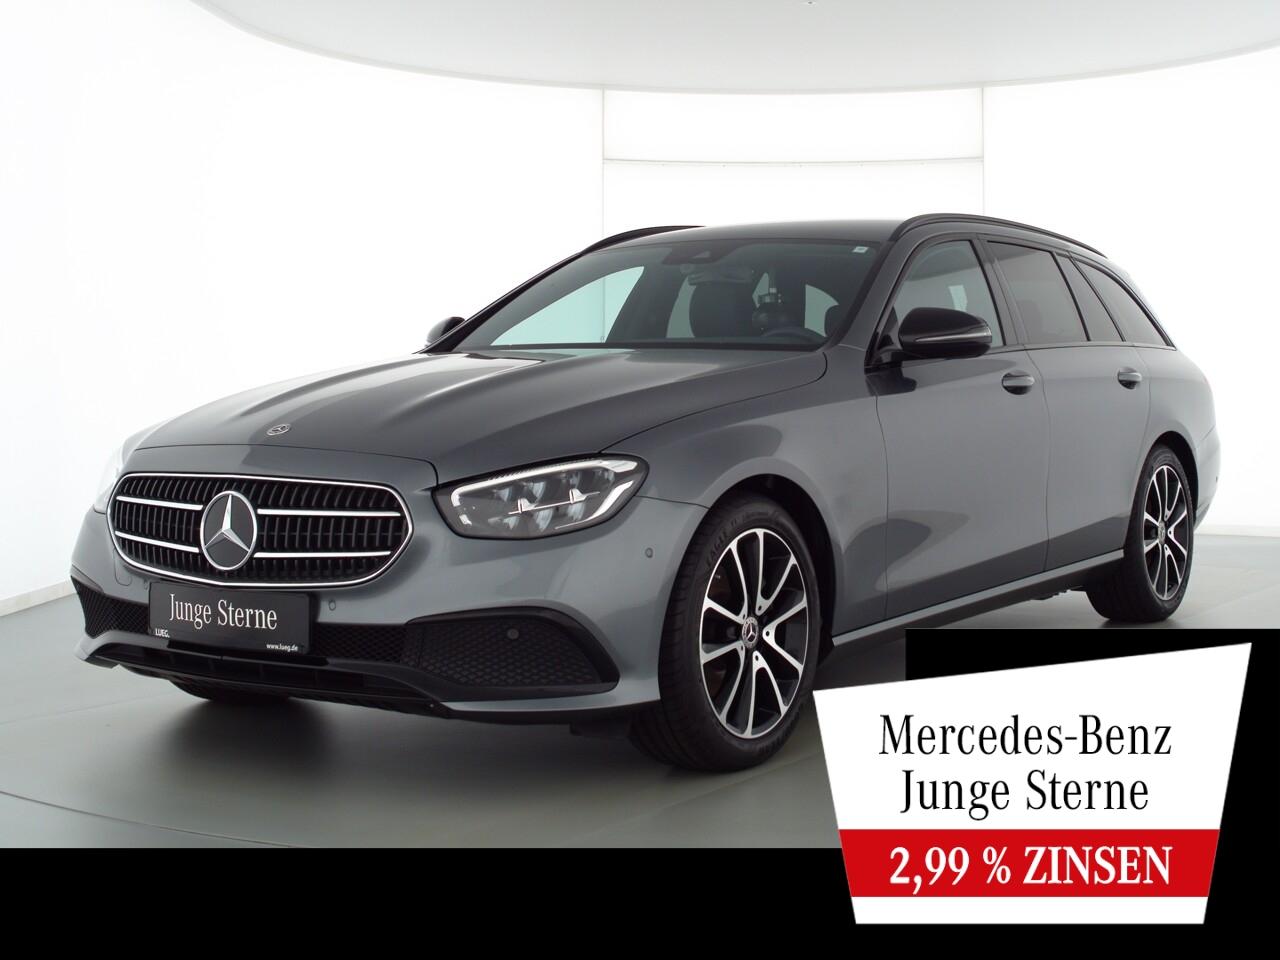 Mercedes-Benz E 220 d T Avantgarde+MBUXHighE+LED-HP+AHK+Kamera, Jahr 2020, Diesel